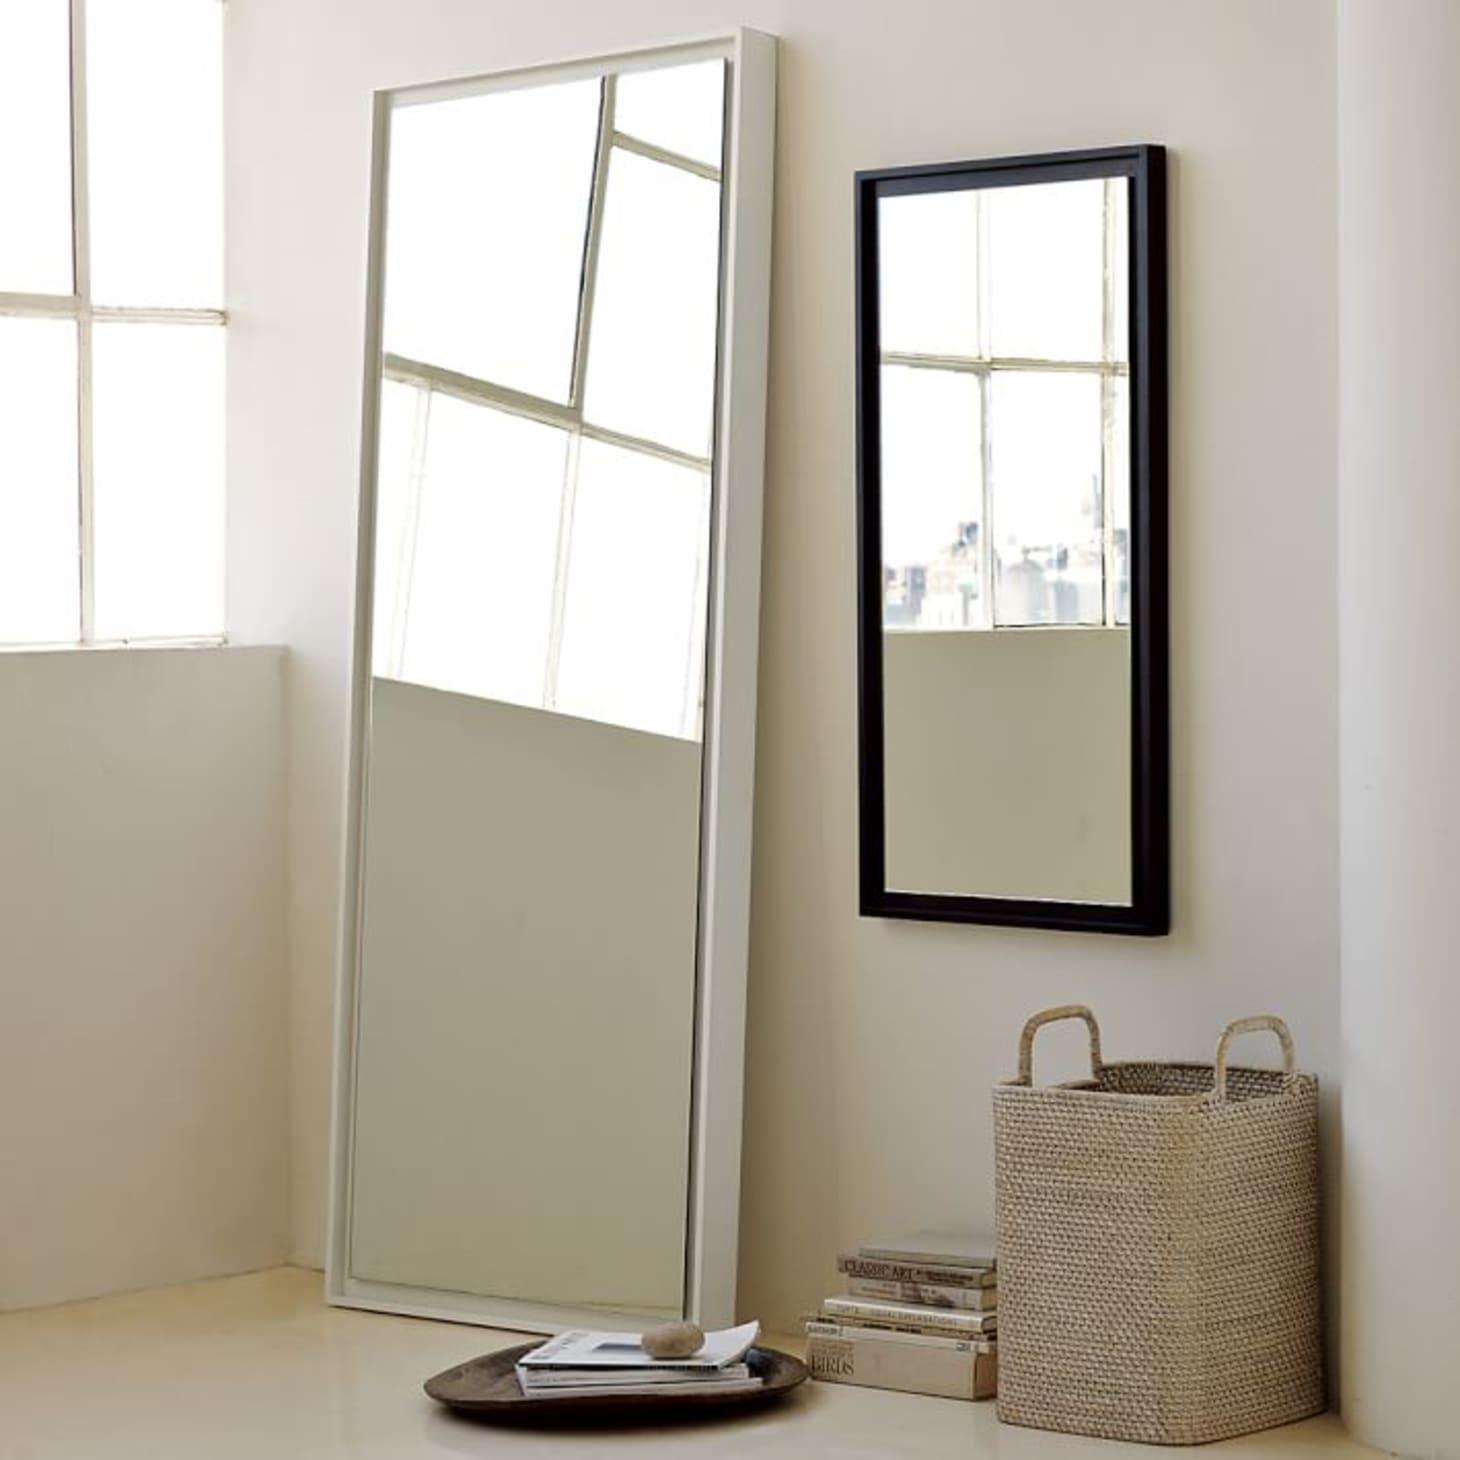 The Best Floor Mirrors: Target, CB2, Wayfair & More ...